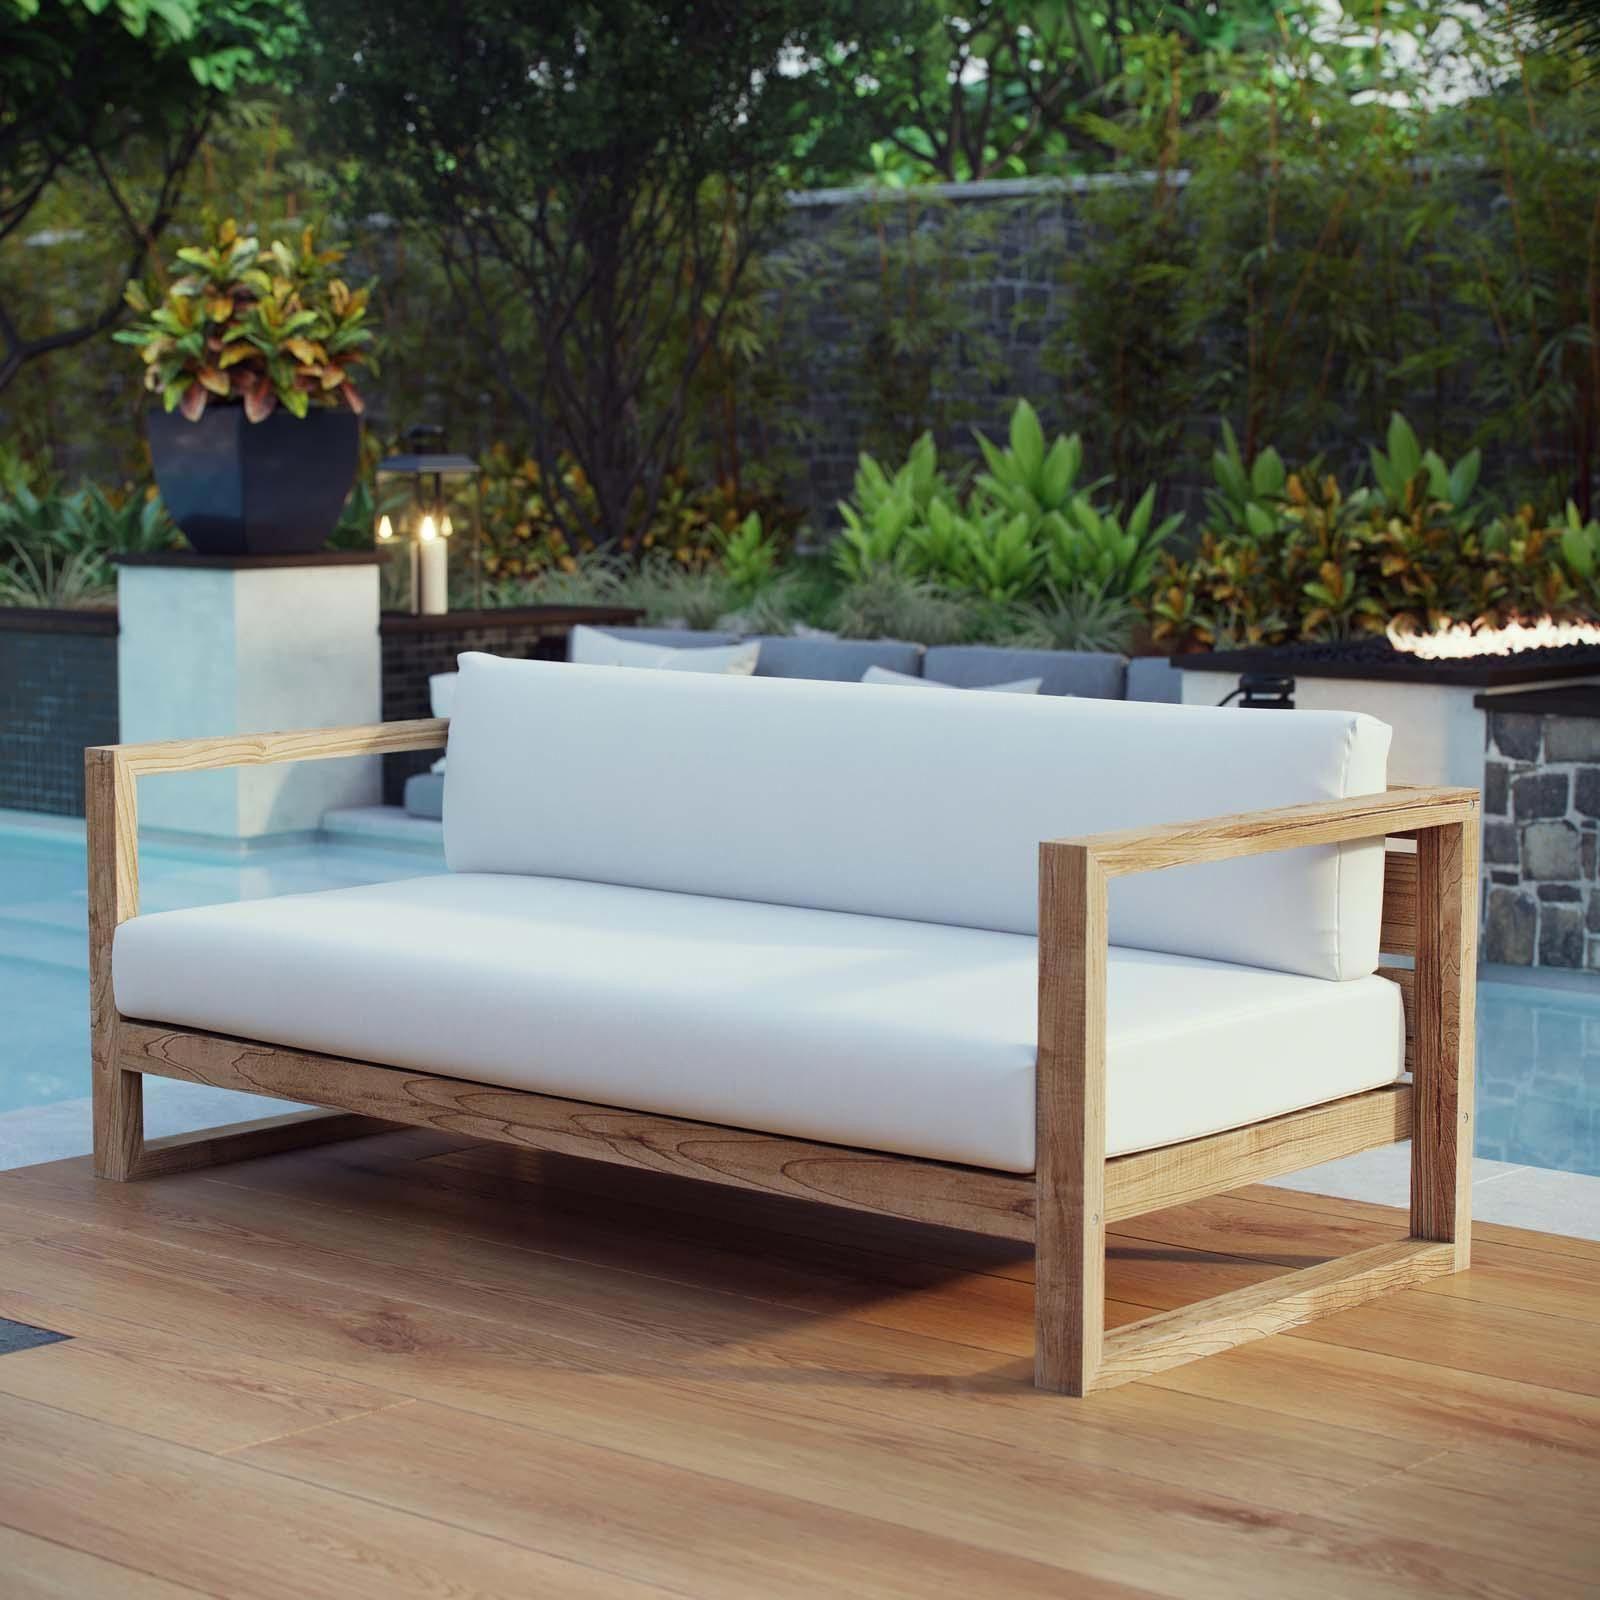 28 Best Modern Furniture Collection Modern Furniture Chairs Furniturejati Furnituremedan Modernfurniture Teak Patio Furniture Wood Patio Furniture Teak Sofa